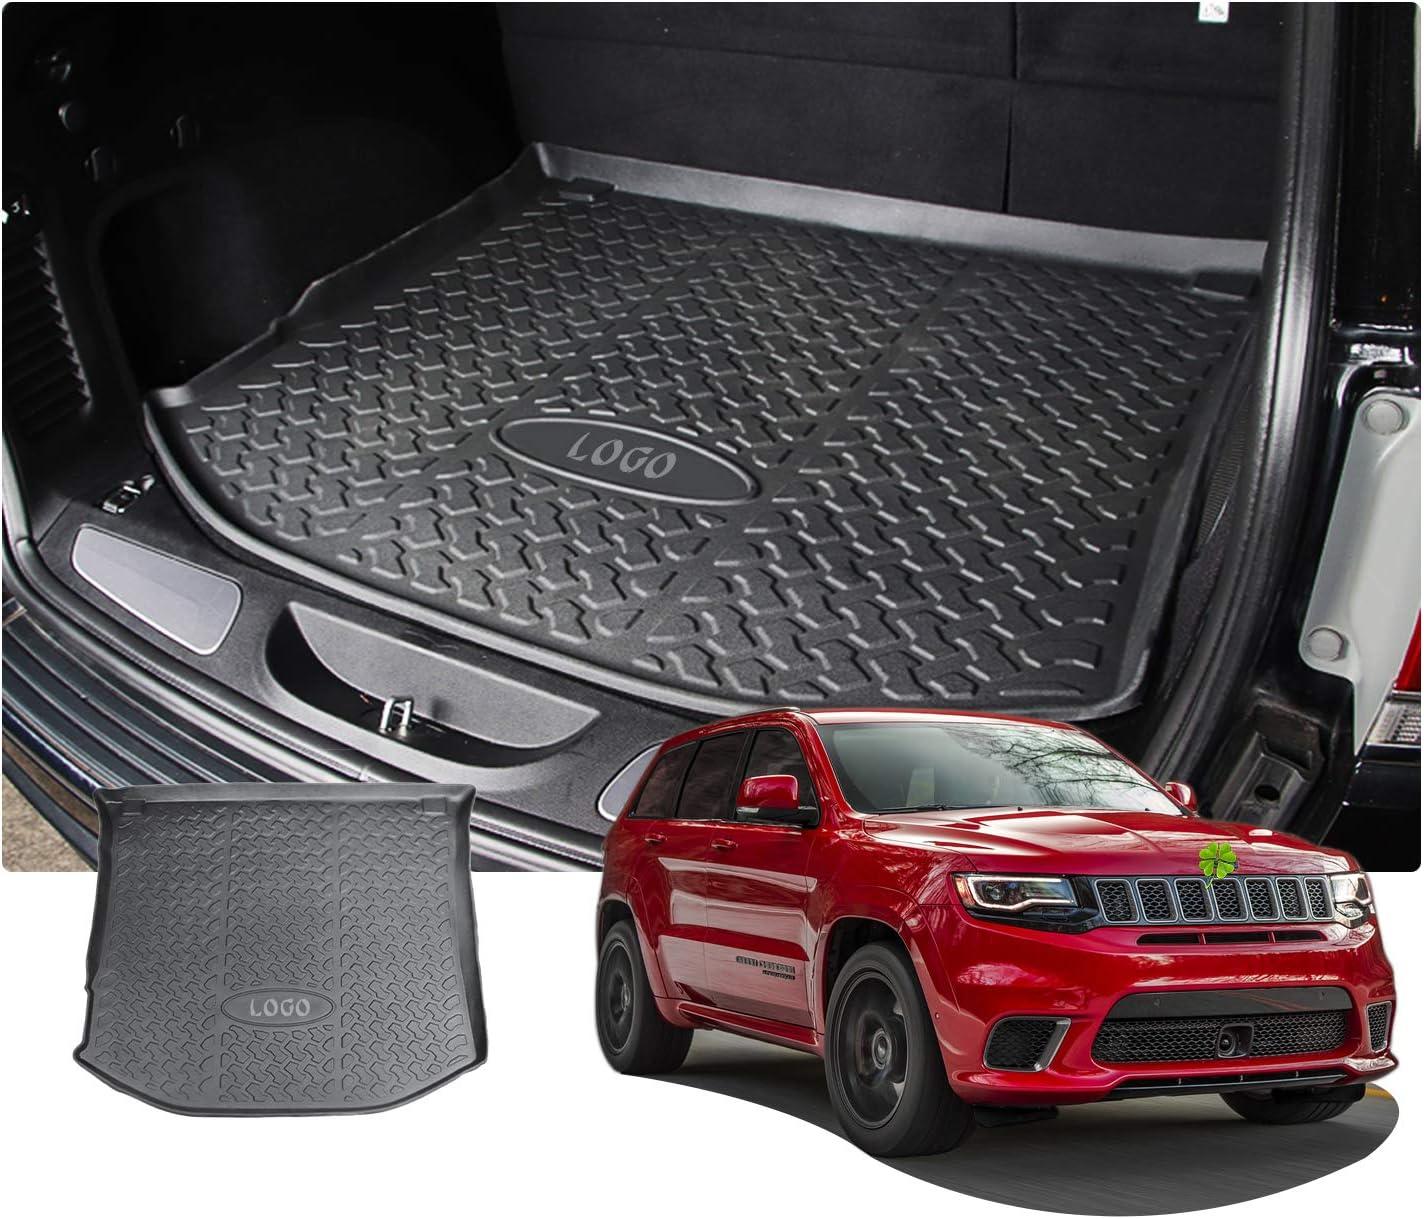 2011-2019 Dodge Durango Cargo Area Tray All Weather Rubber Slush Mat MOPAR OEM